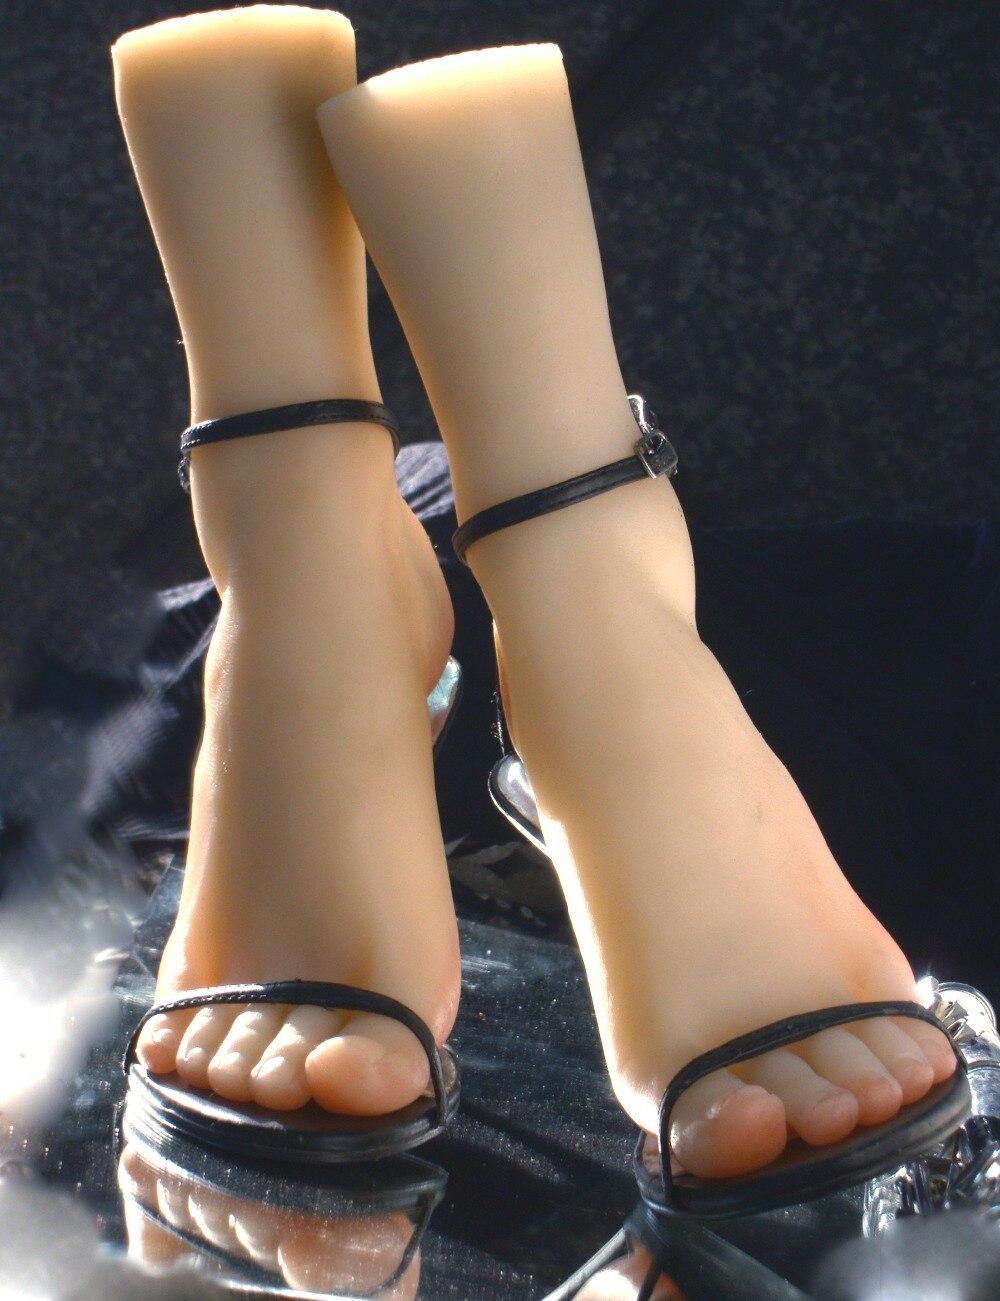 2015 New Arrival font b Sex b font Toy Feet Fetish Toys for Man Lifelike Female